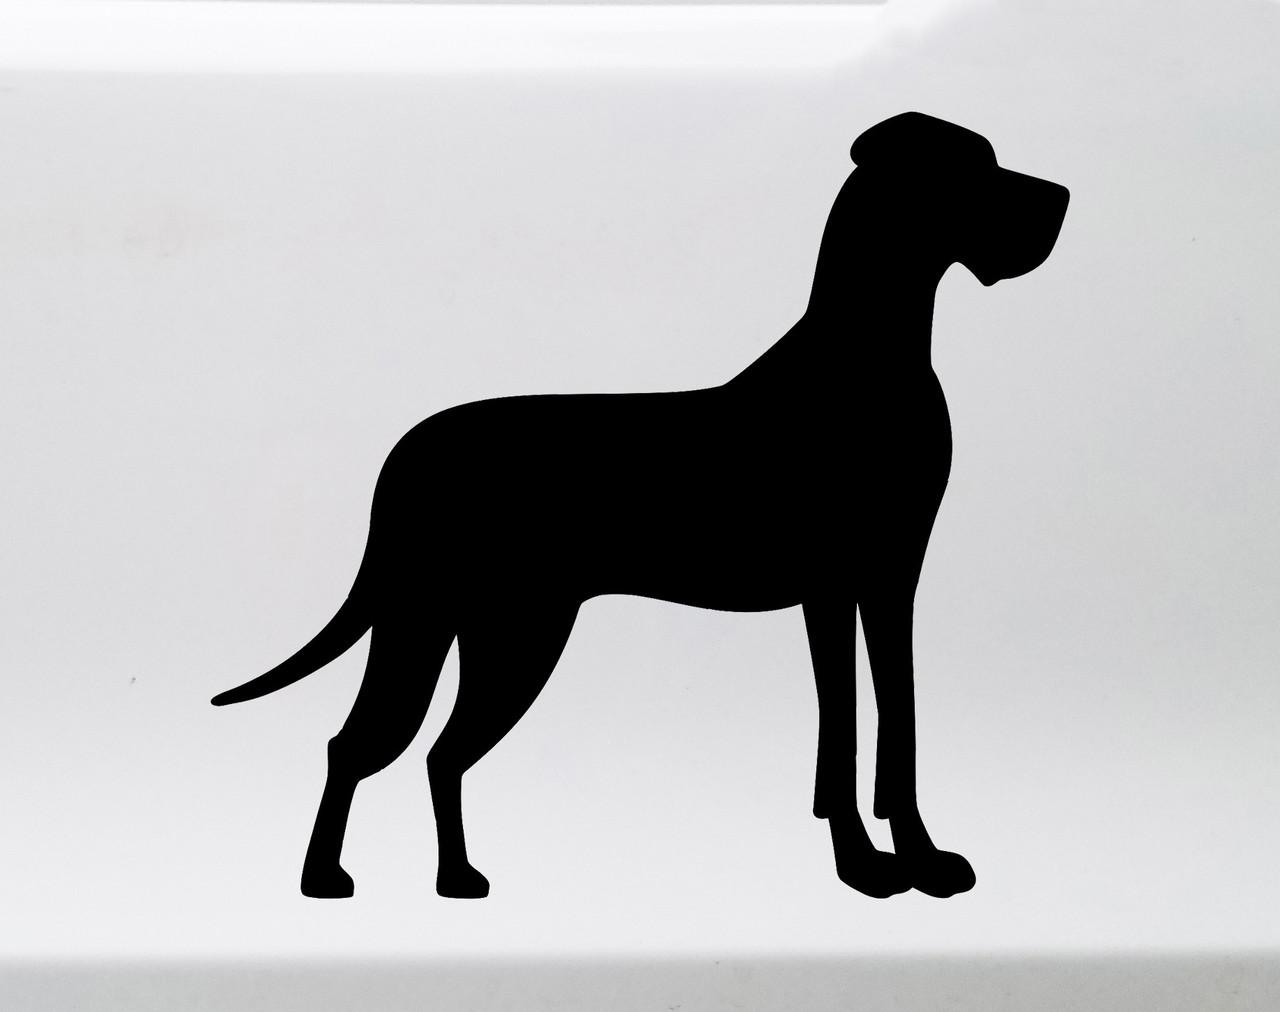 Great Dane Dog Animal Vinyl Die Cut Car Decal Sticker